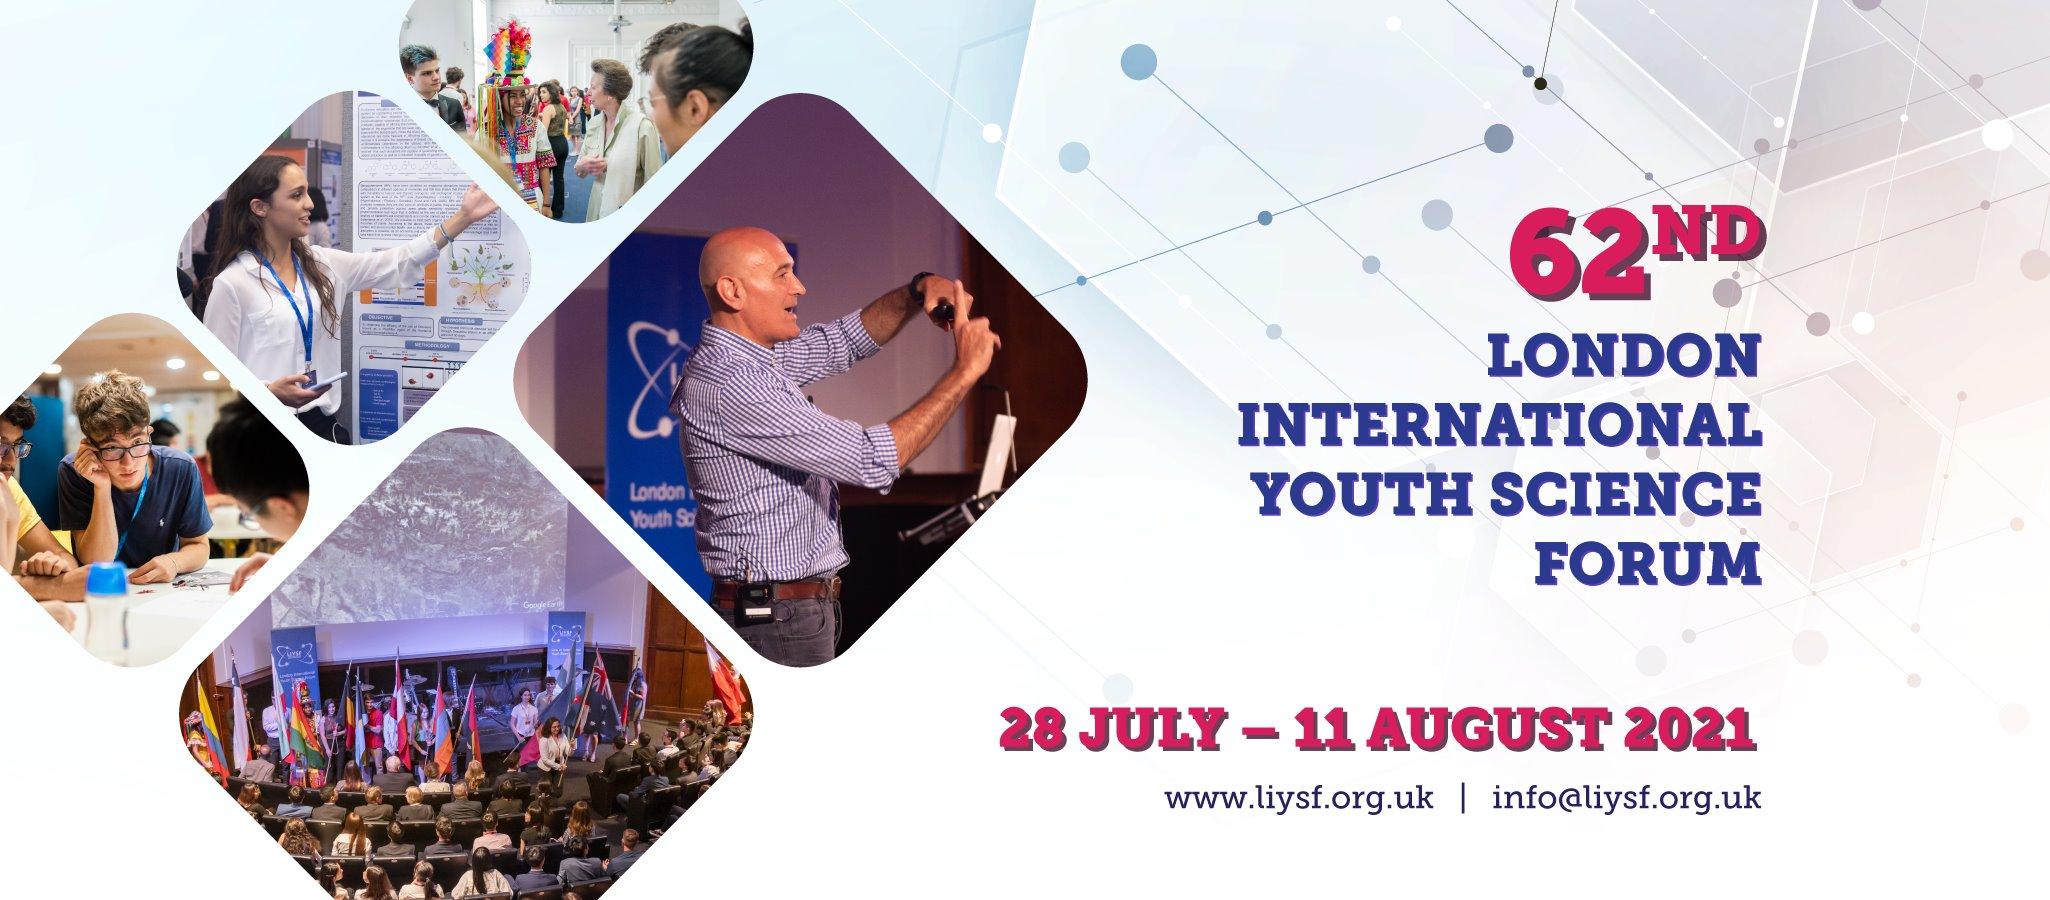 LONDON INTERNATIONAL YOUTH SCIENCE FORUM (LIYSF)